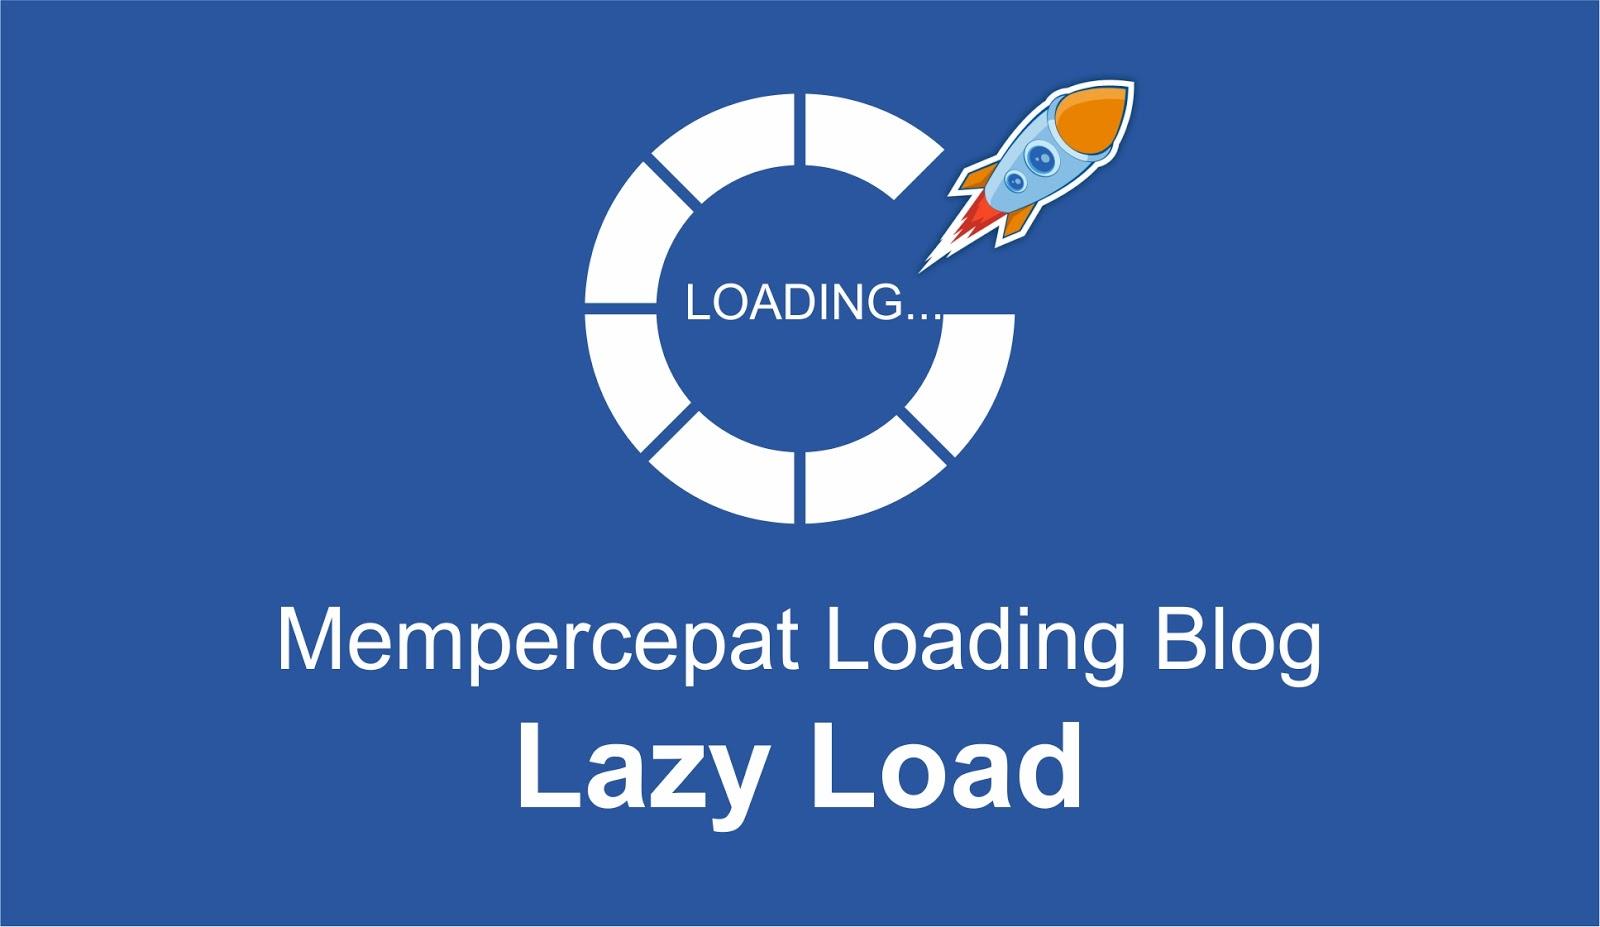 Mempercepat Loading Blog Menggunakan Lazy Load Adsense